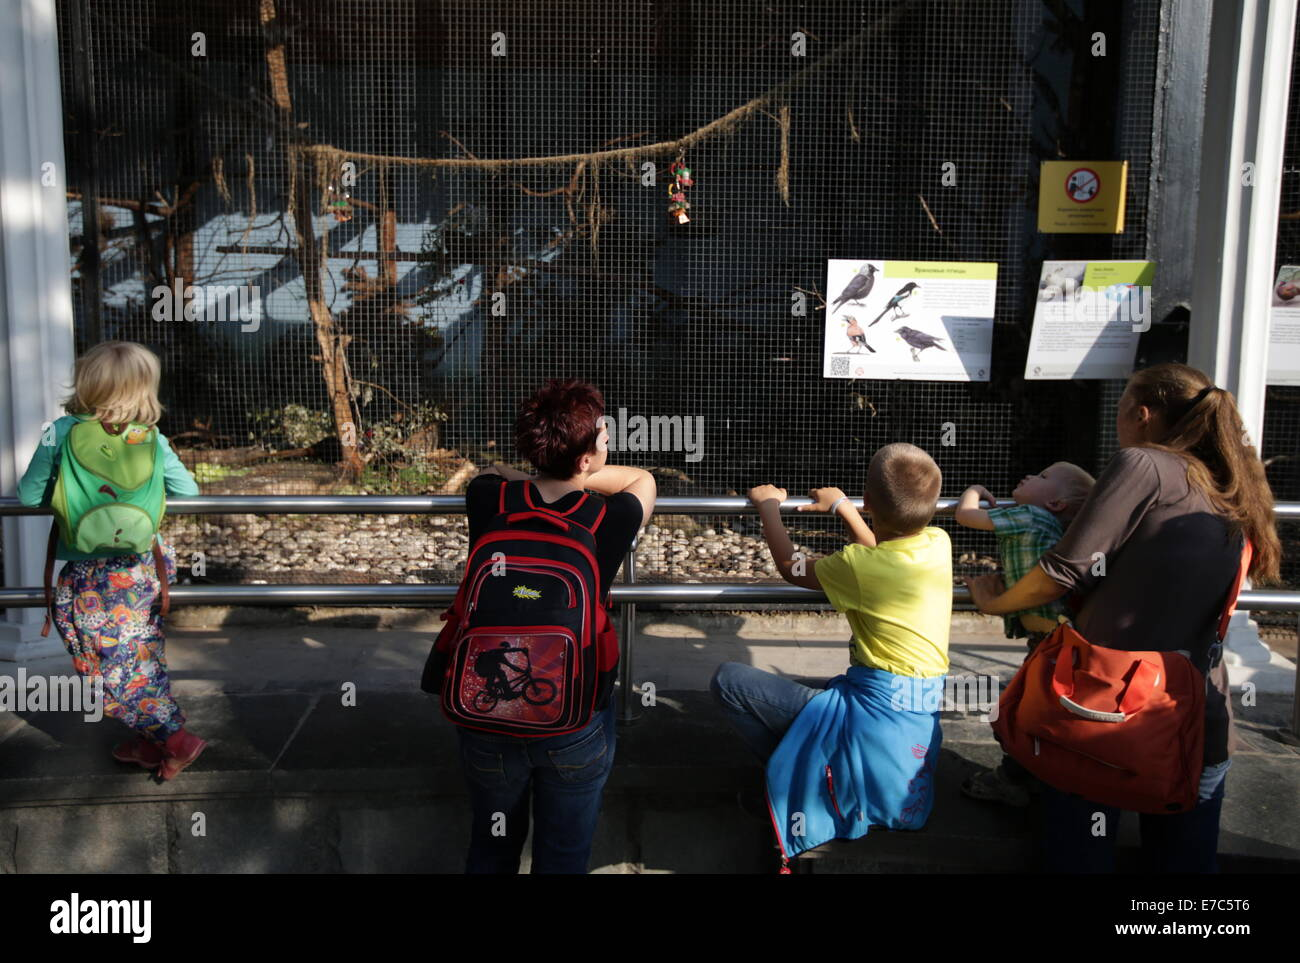 Moscow, Russia. 11th Sep, 2014. Children at the Moscow Zoo. © Stanislav Krasilnikov/ITAR-TASS/Alamy Live News - Stock Image